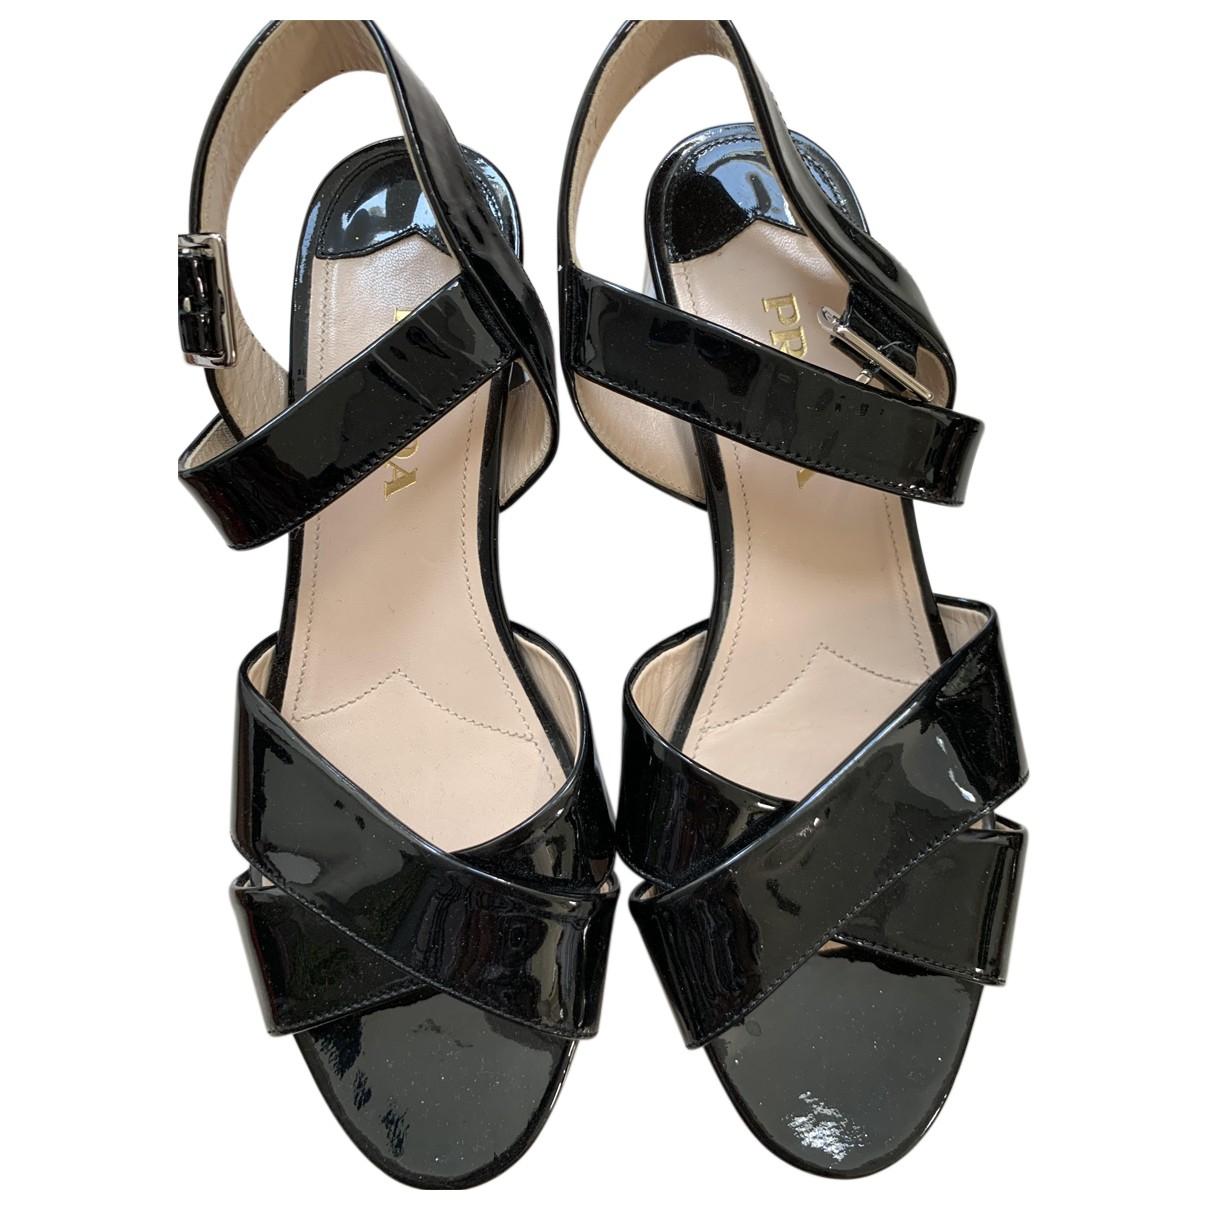 Prada N Black Patent leather Sandals for Women 37 EU